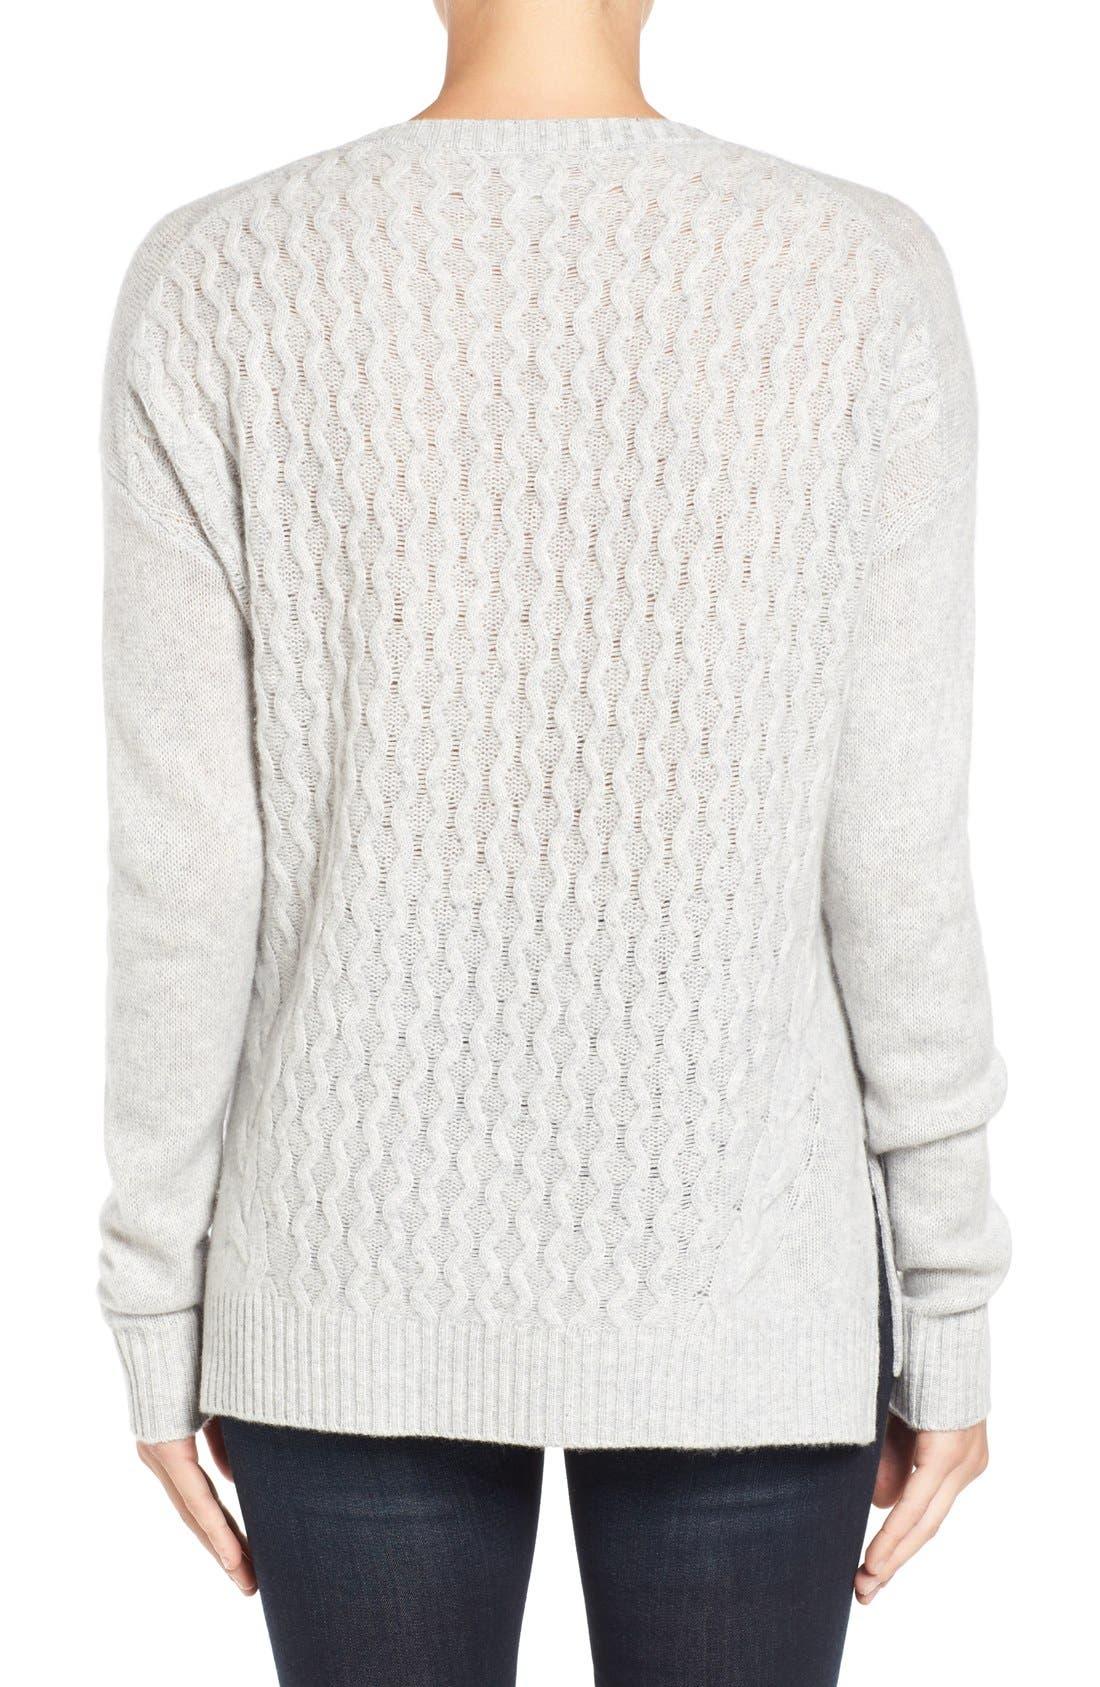 Alternate Image 3  - Halogen® Cable Knit Wool & Cashmere Sweater (Regular & Petite)